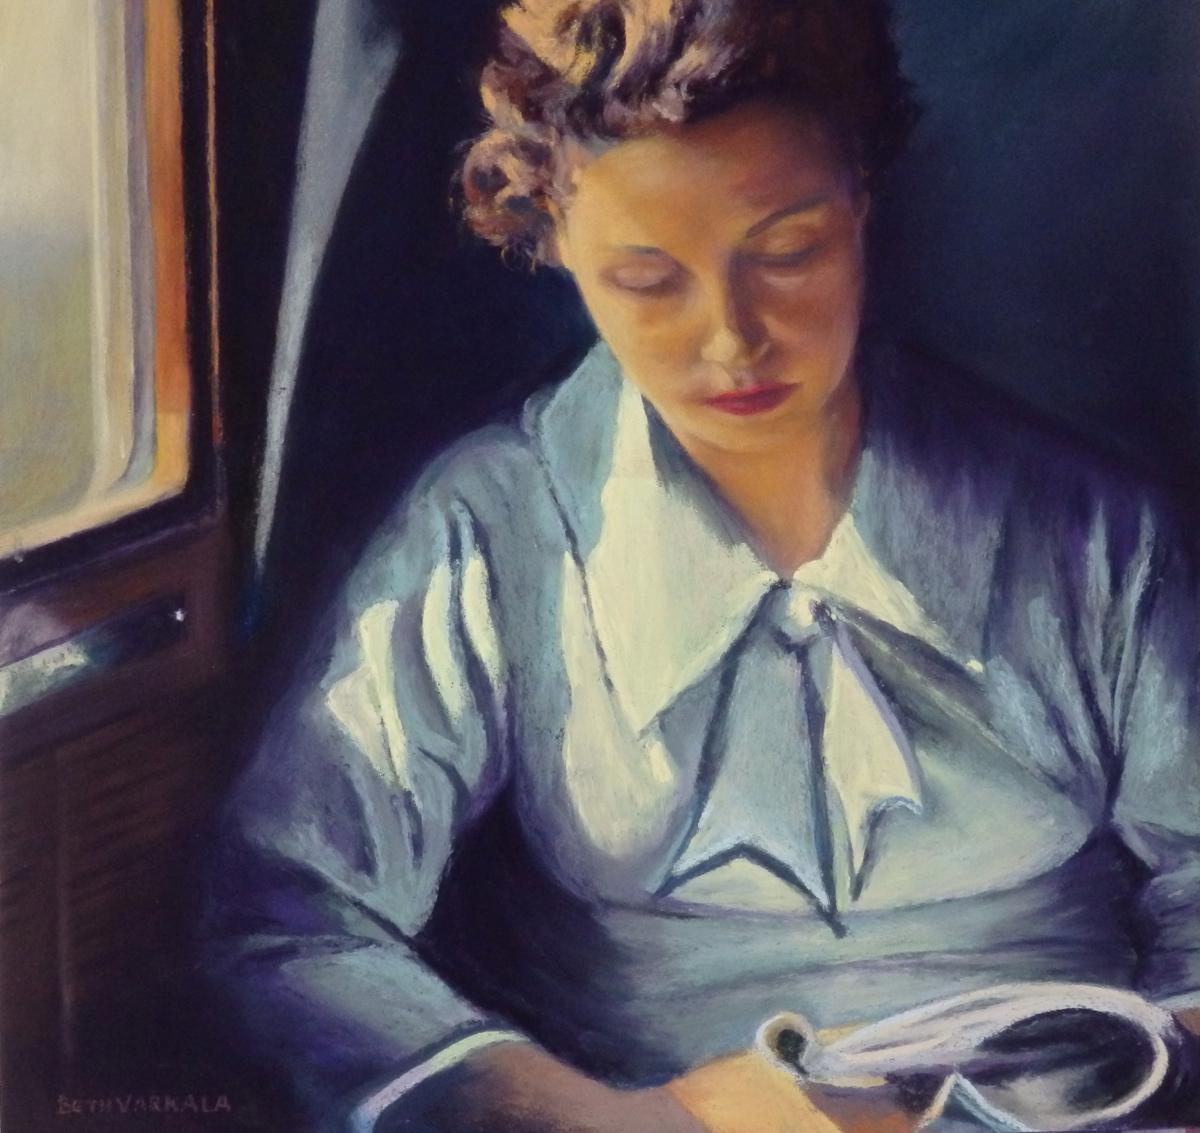 Best in Category Portrait/Figure - Beth Varkala (large view)